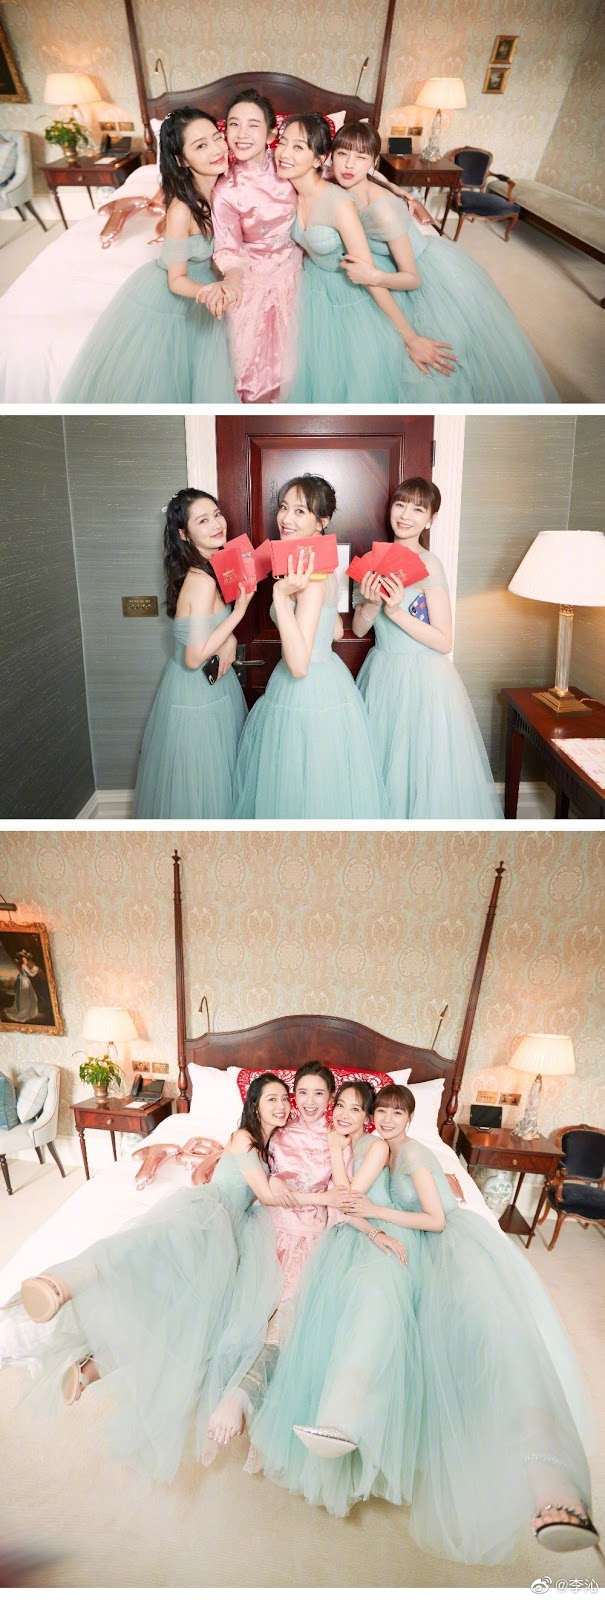 Tina Tang Yixin bridesmaids Li Qin Victoria Song Shen Mengchen